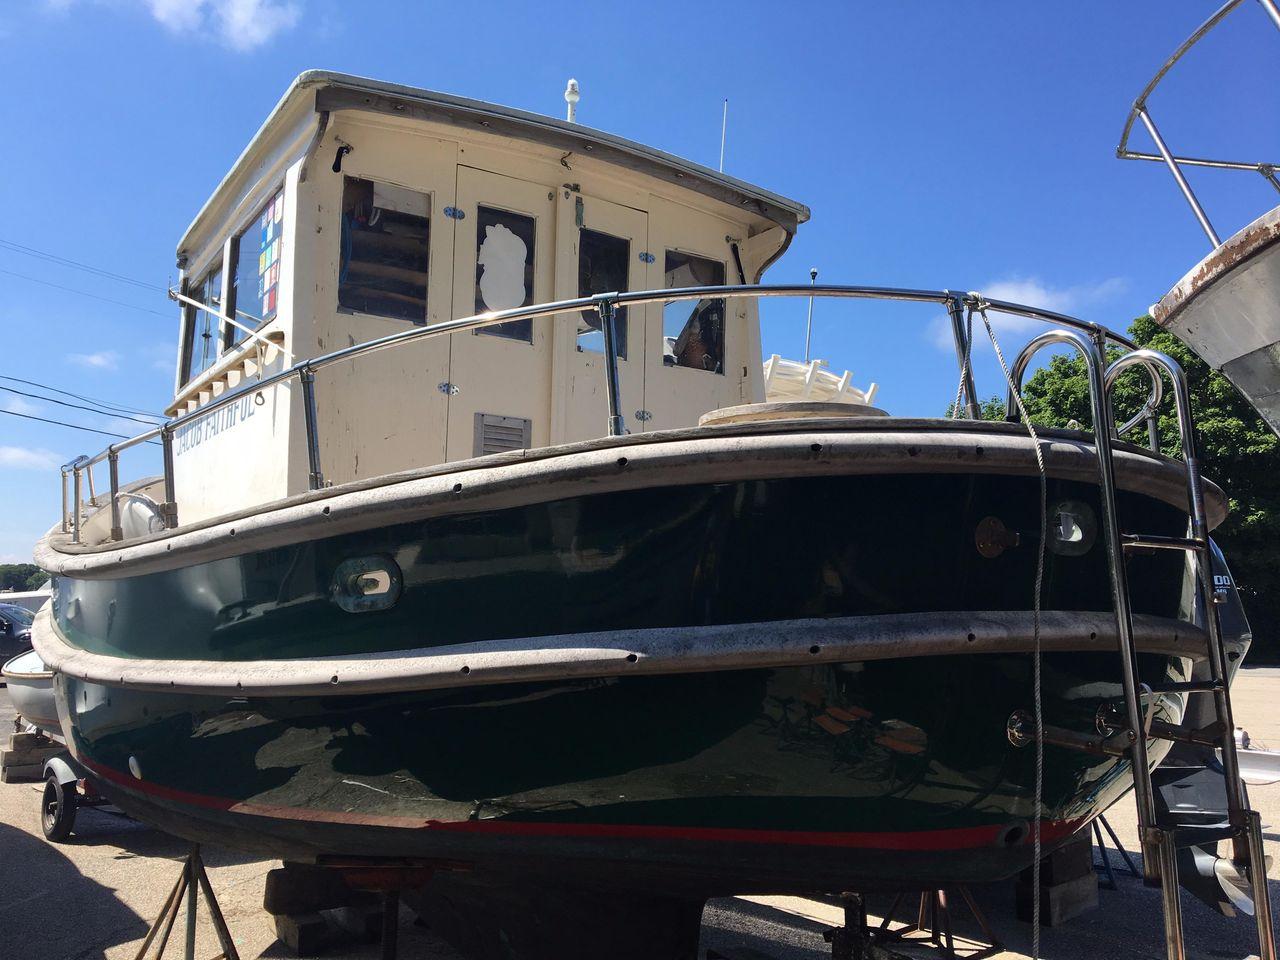 1972 Used Tugboat 21 Tug Boat For Sale - $11,900 ...